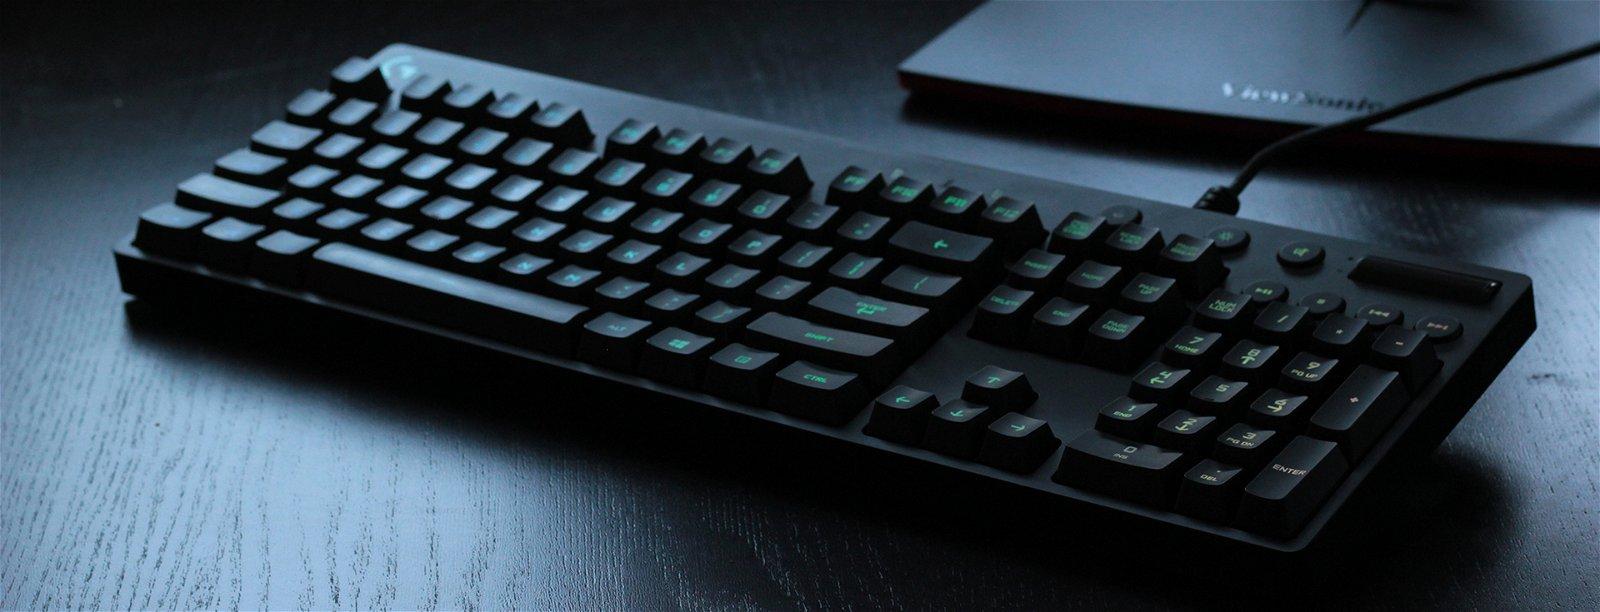 Logitech G810 Orion Spectrum Mechanical Keyboard Review 4